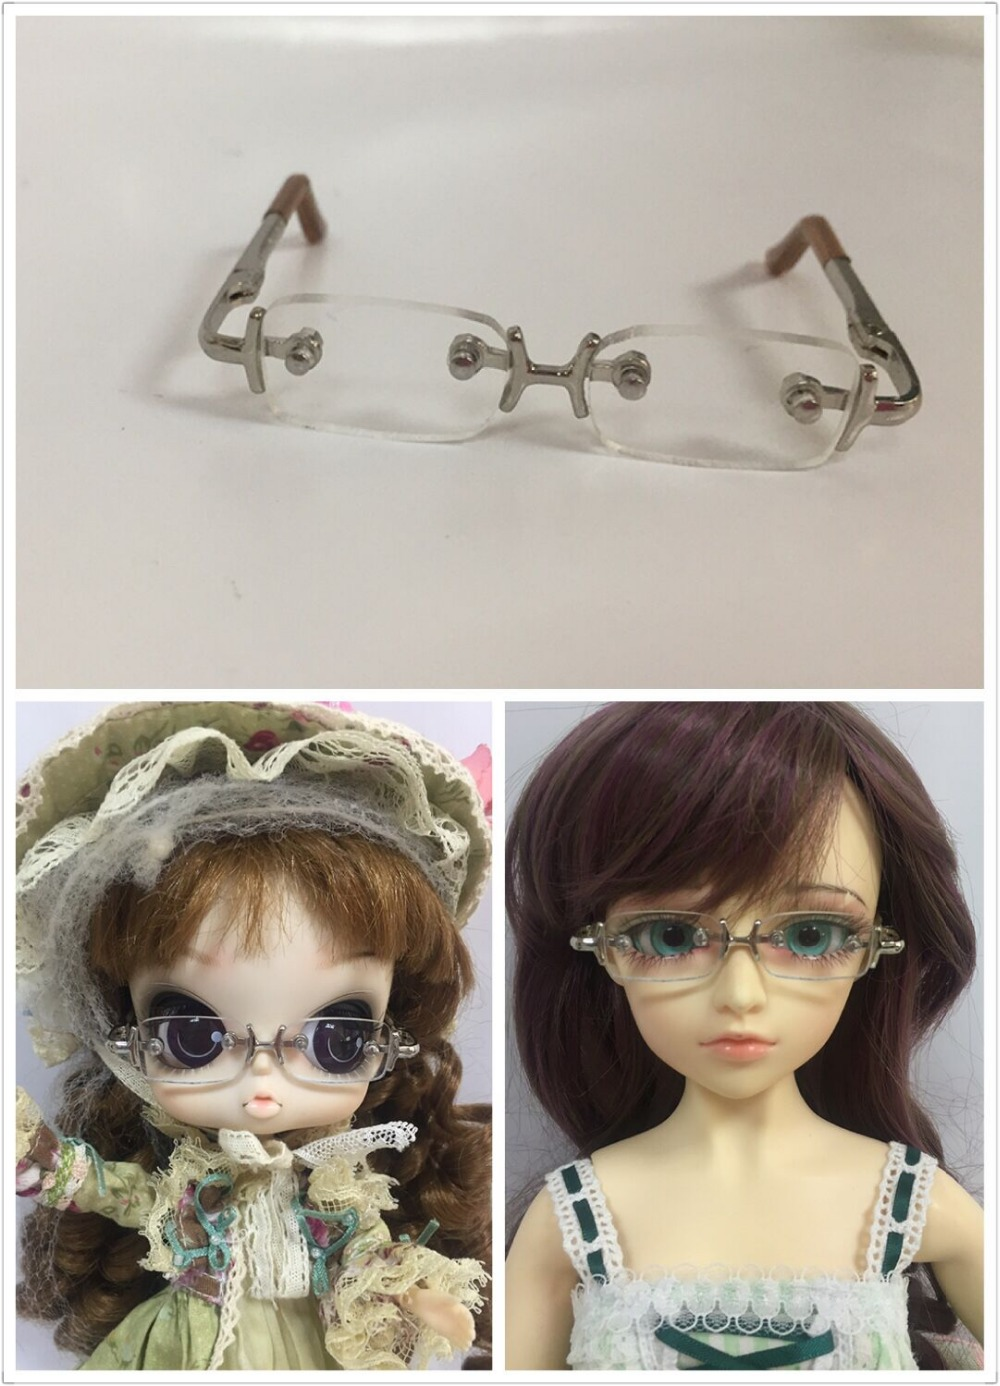 b3d9b852bec1a BdJD óculos boneca 6.5 cm, para 1 3 boneca BJD, pullip 0621 em Bonecas de  Brinquedos no AliExpress.com   Alibaba Group